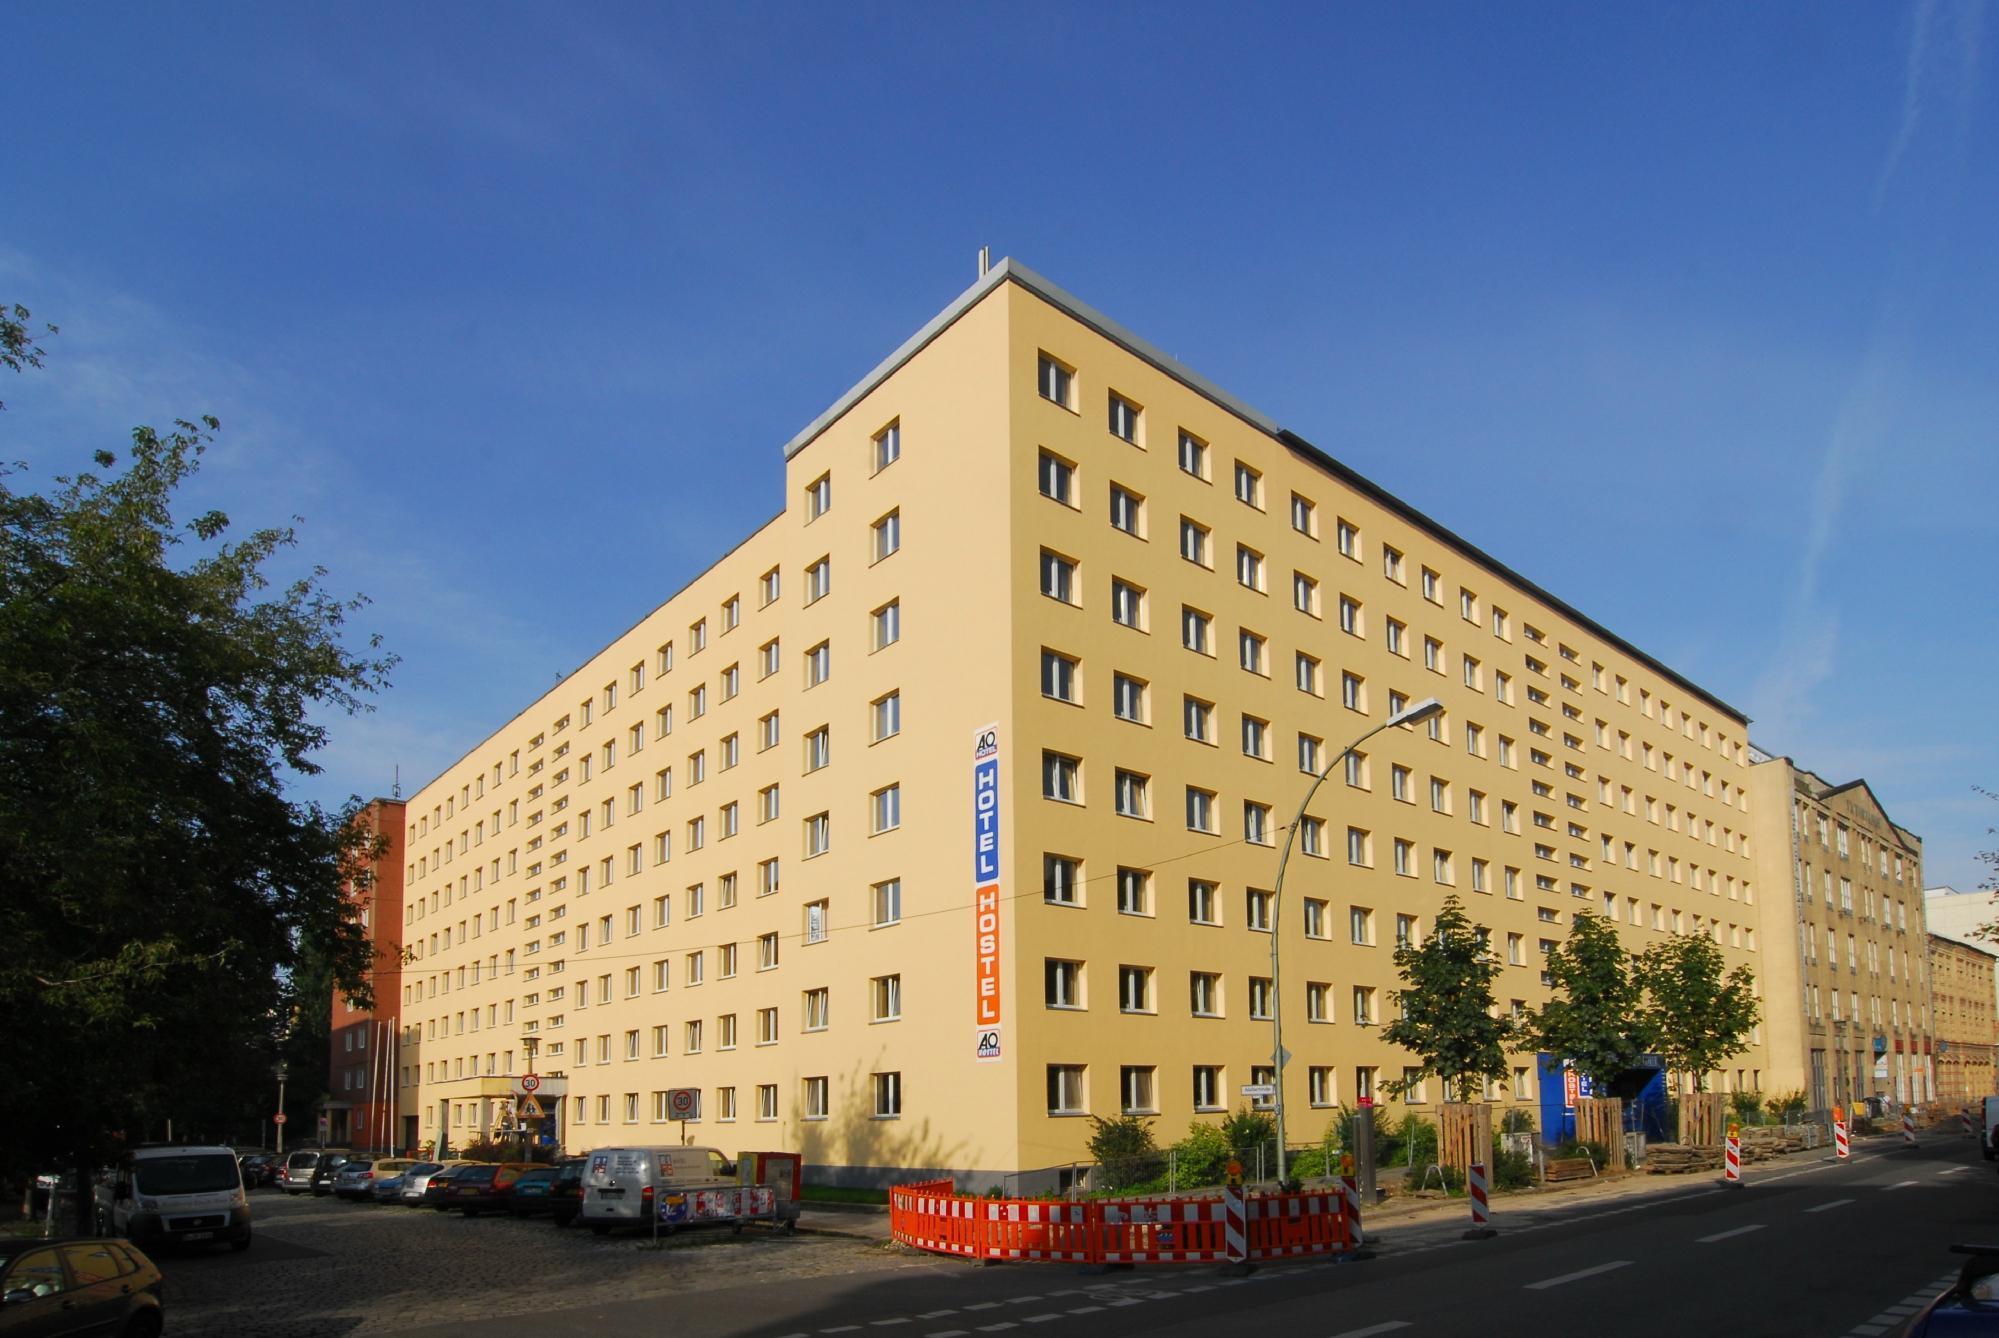 A&O Berlin Mitte